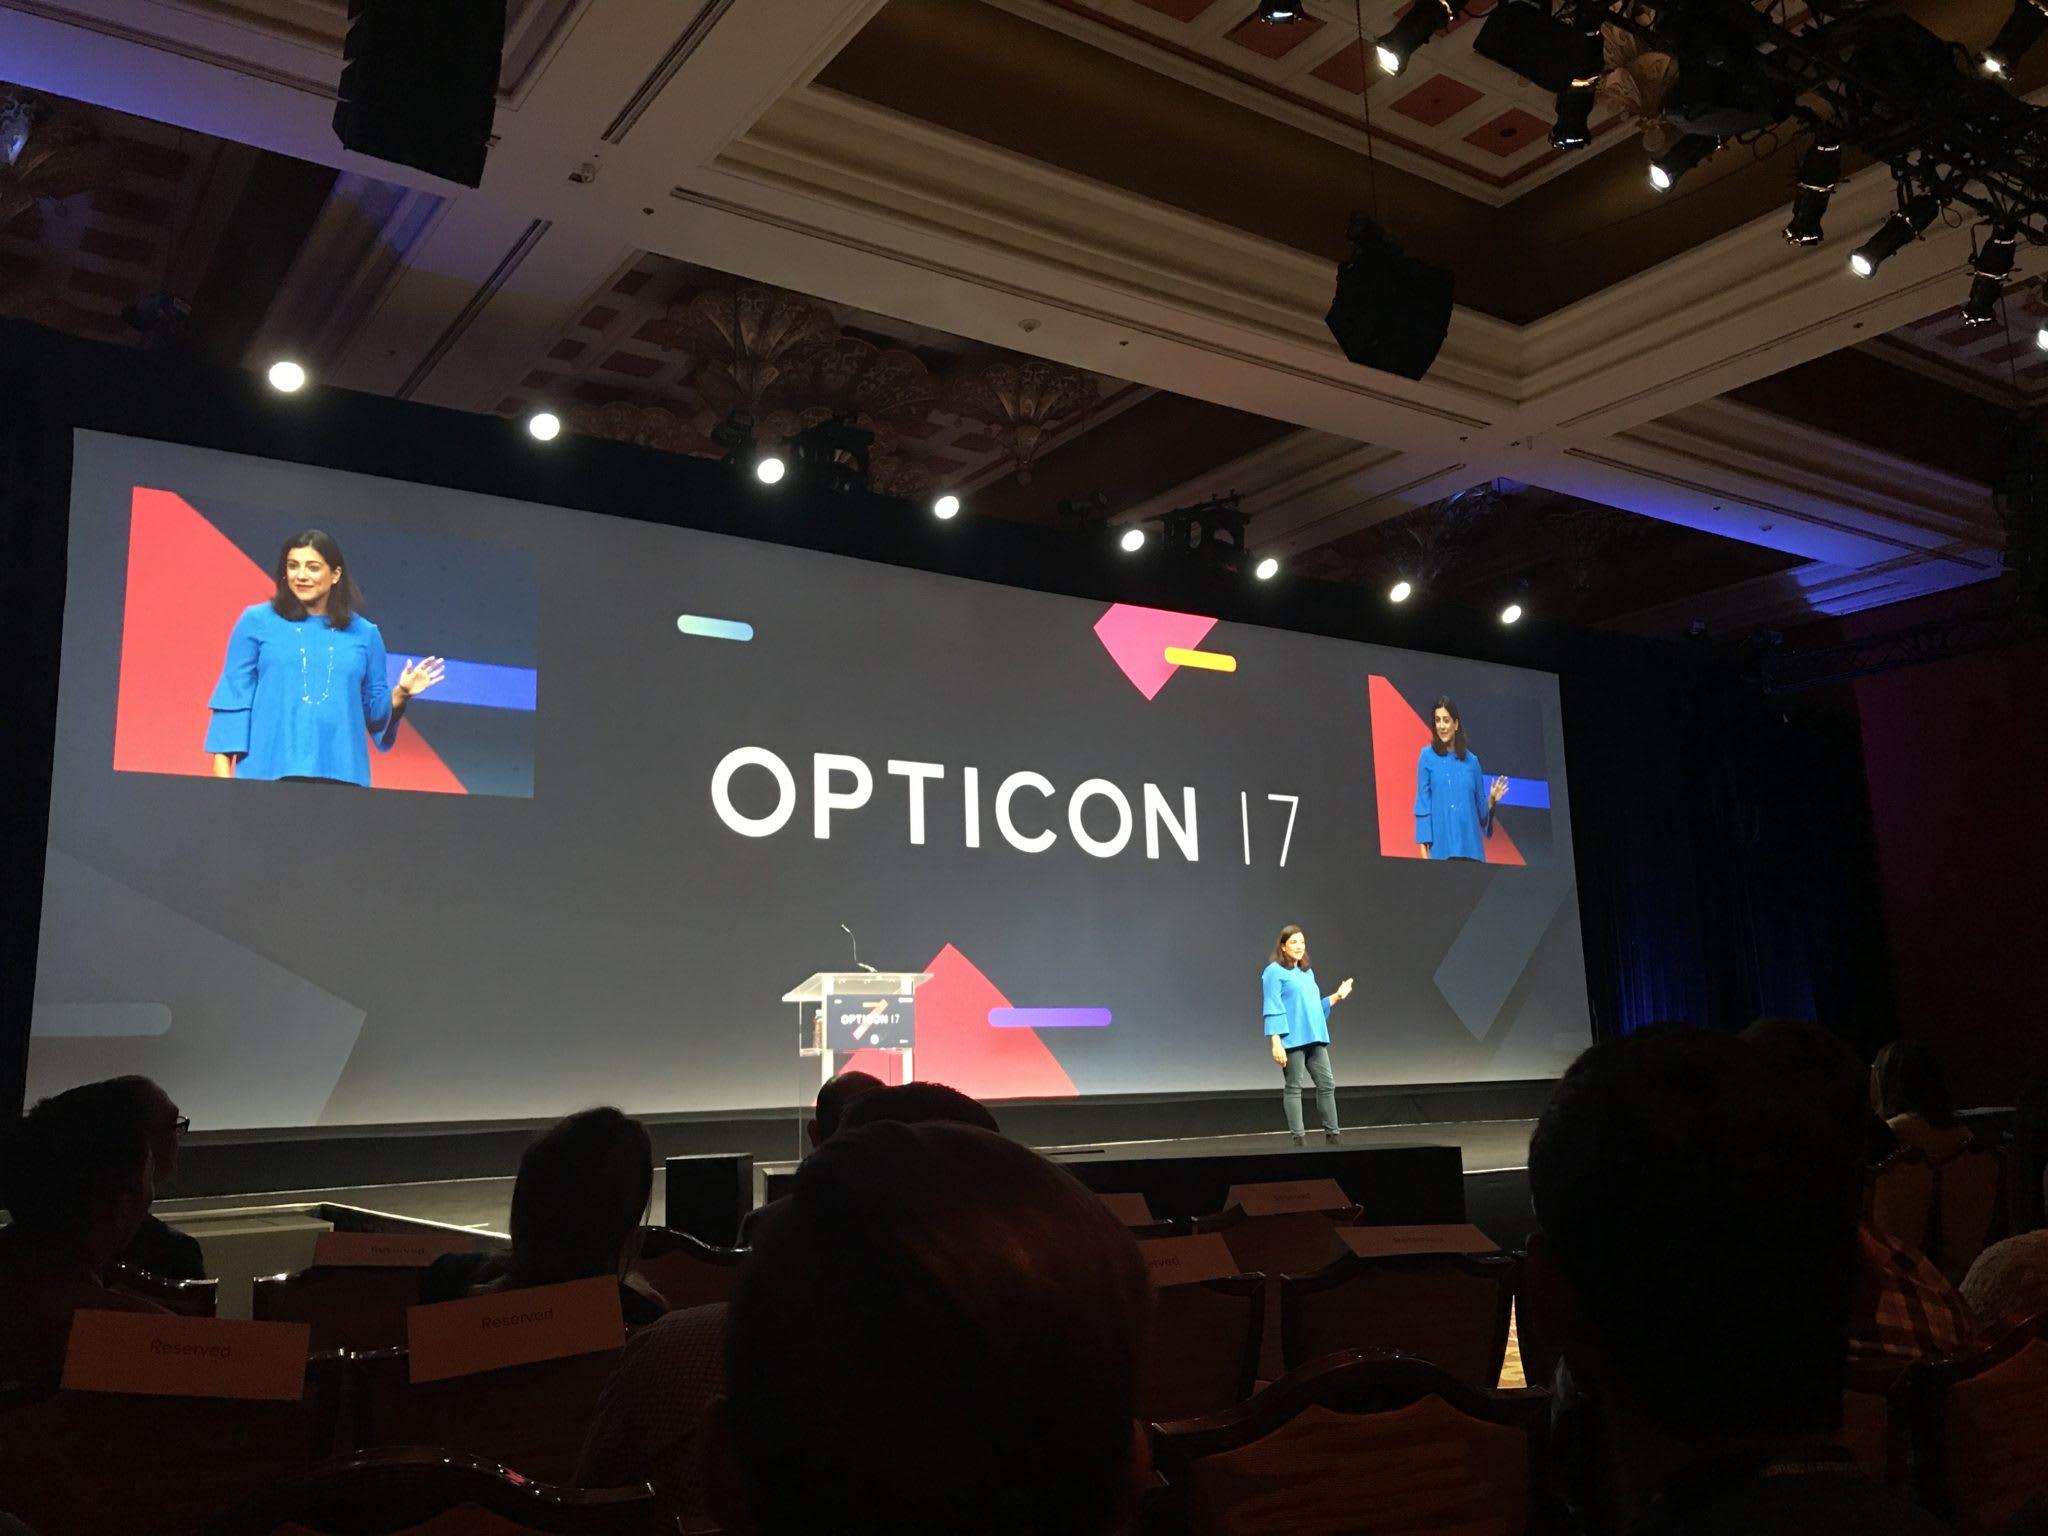 Opticon 2017 - Presentation screen w/audience